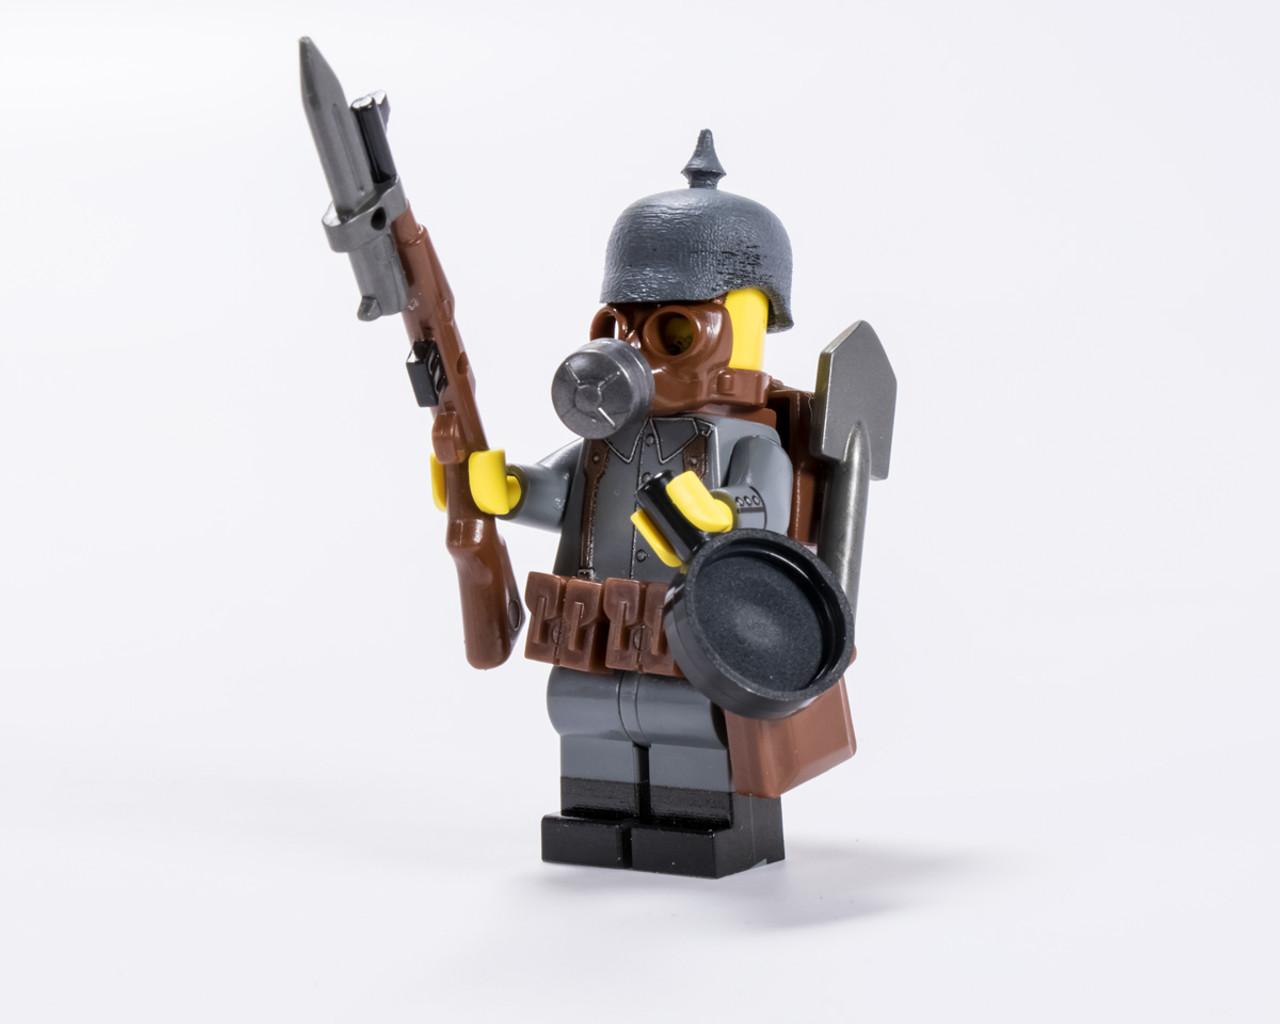 German Ww1 Gas Mask Soldier V2 Brickmania Toys